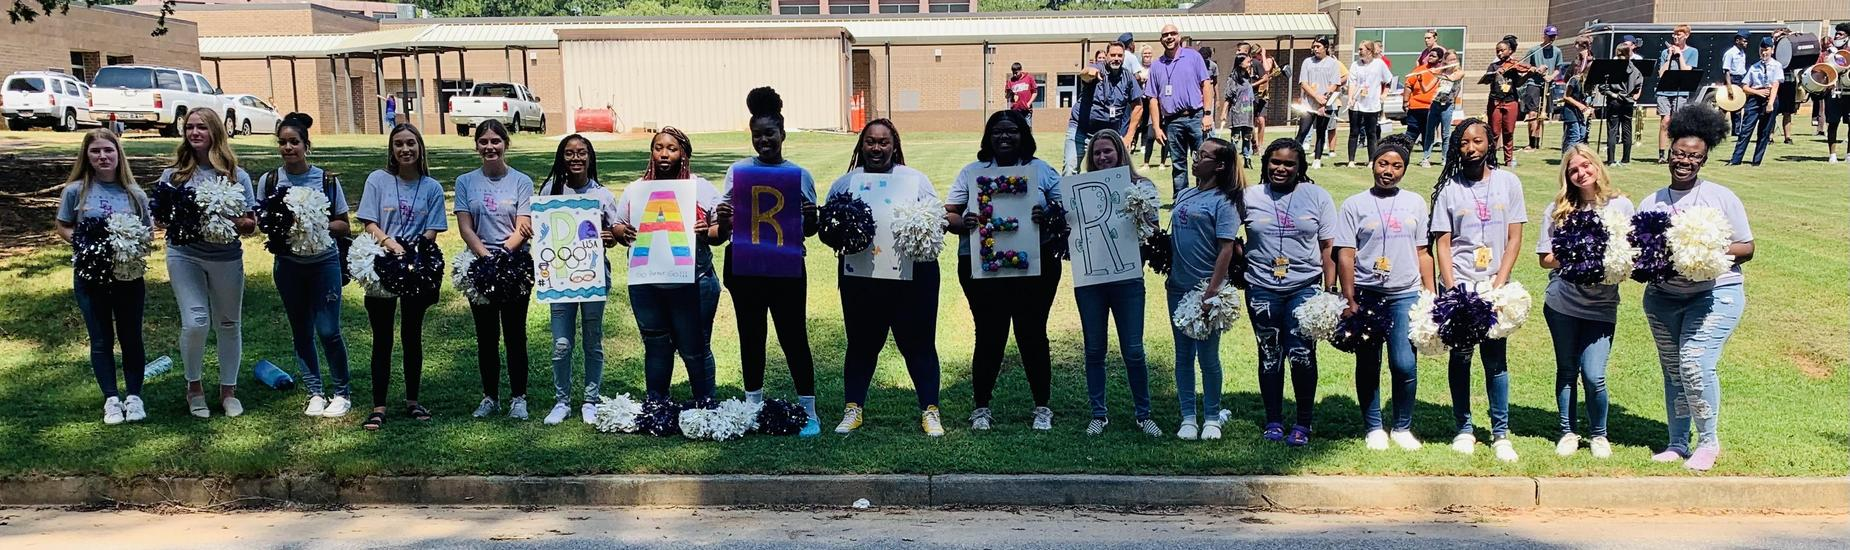 Students at Emerald High School Celebrate Parker Egbert at Parade